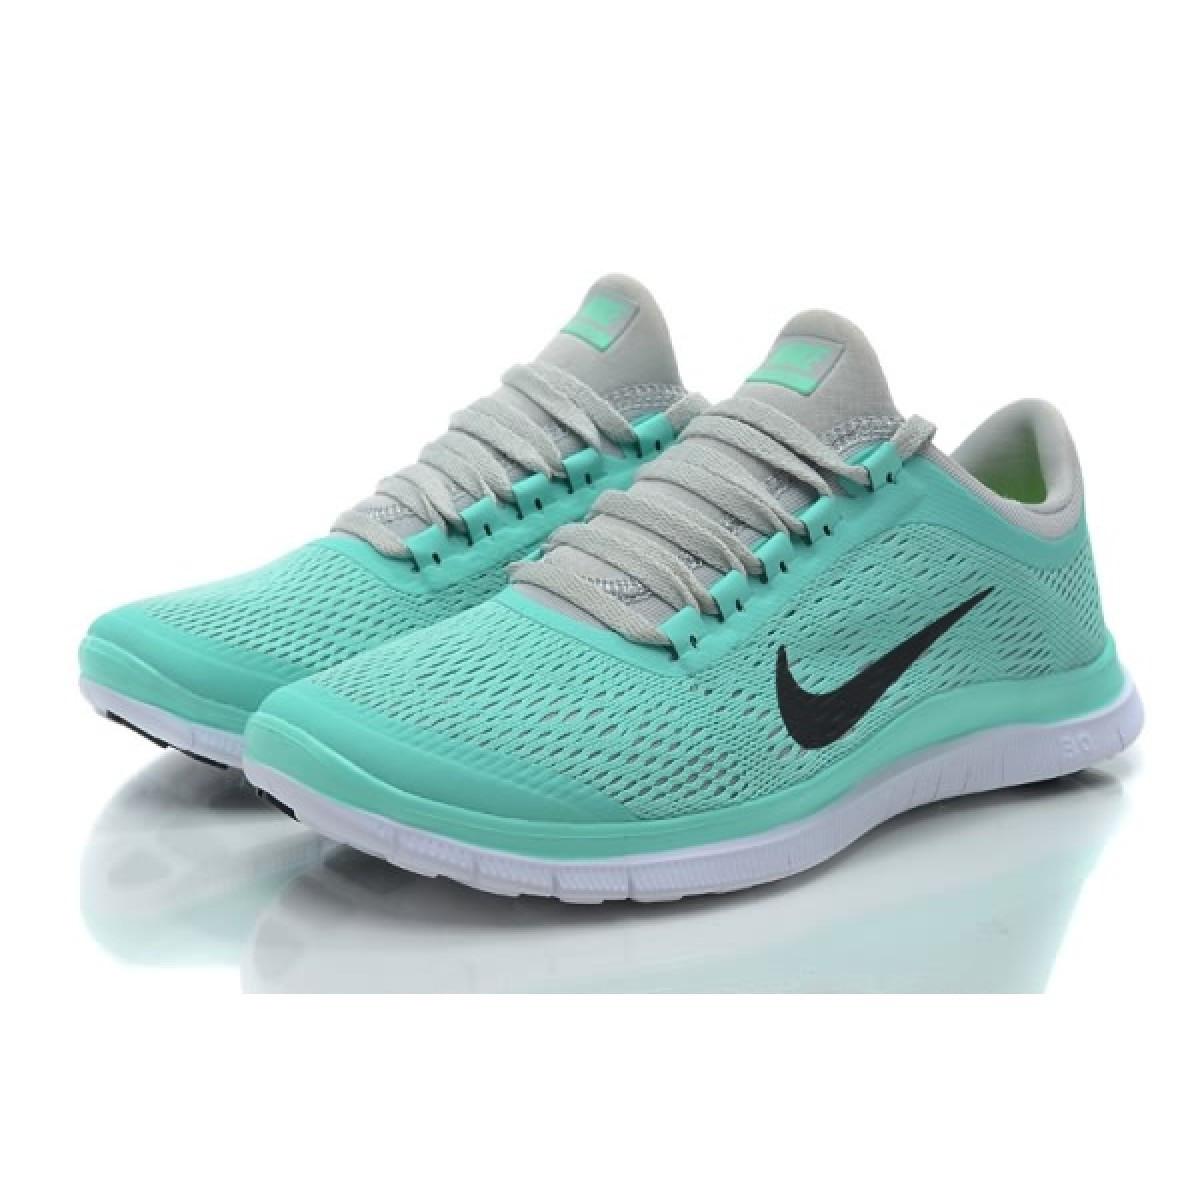 98a48c4e Кроссовки женские Nike Free Run 3.0 V5 бирюзовые - Интернет магазин обуви « im-РоLLi